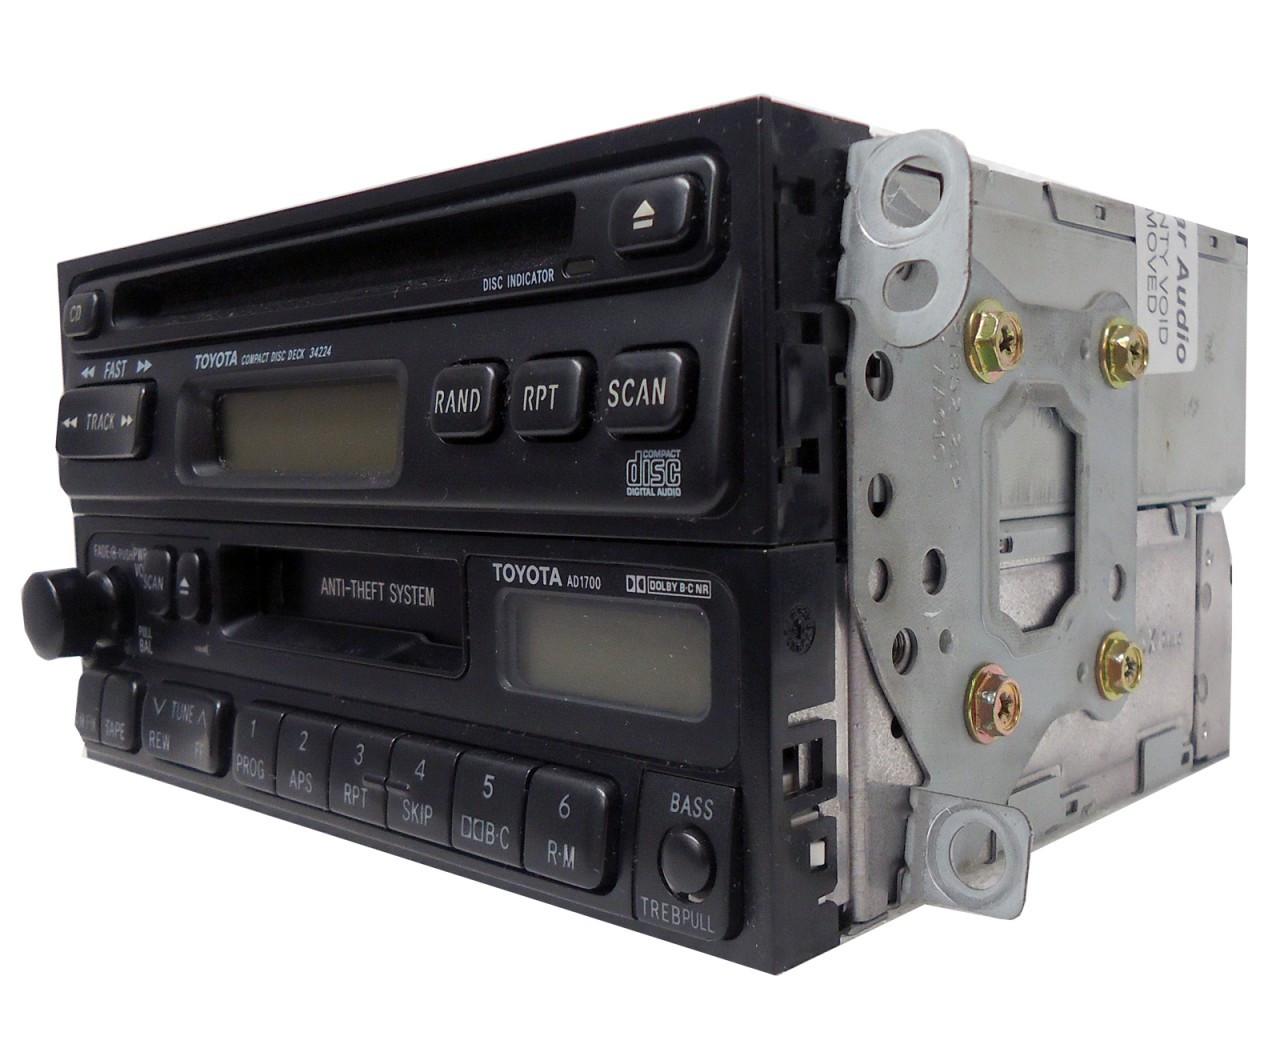 small resolution of  90 91 92 93 94 95 96 97 98 99 toyota celica 4runner camry radio tape